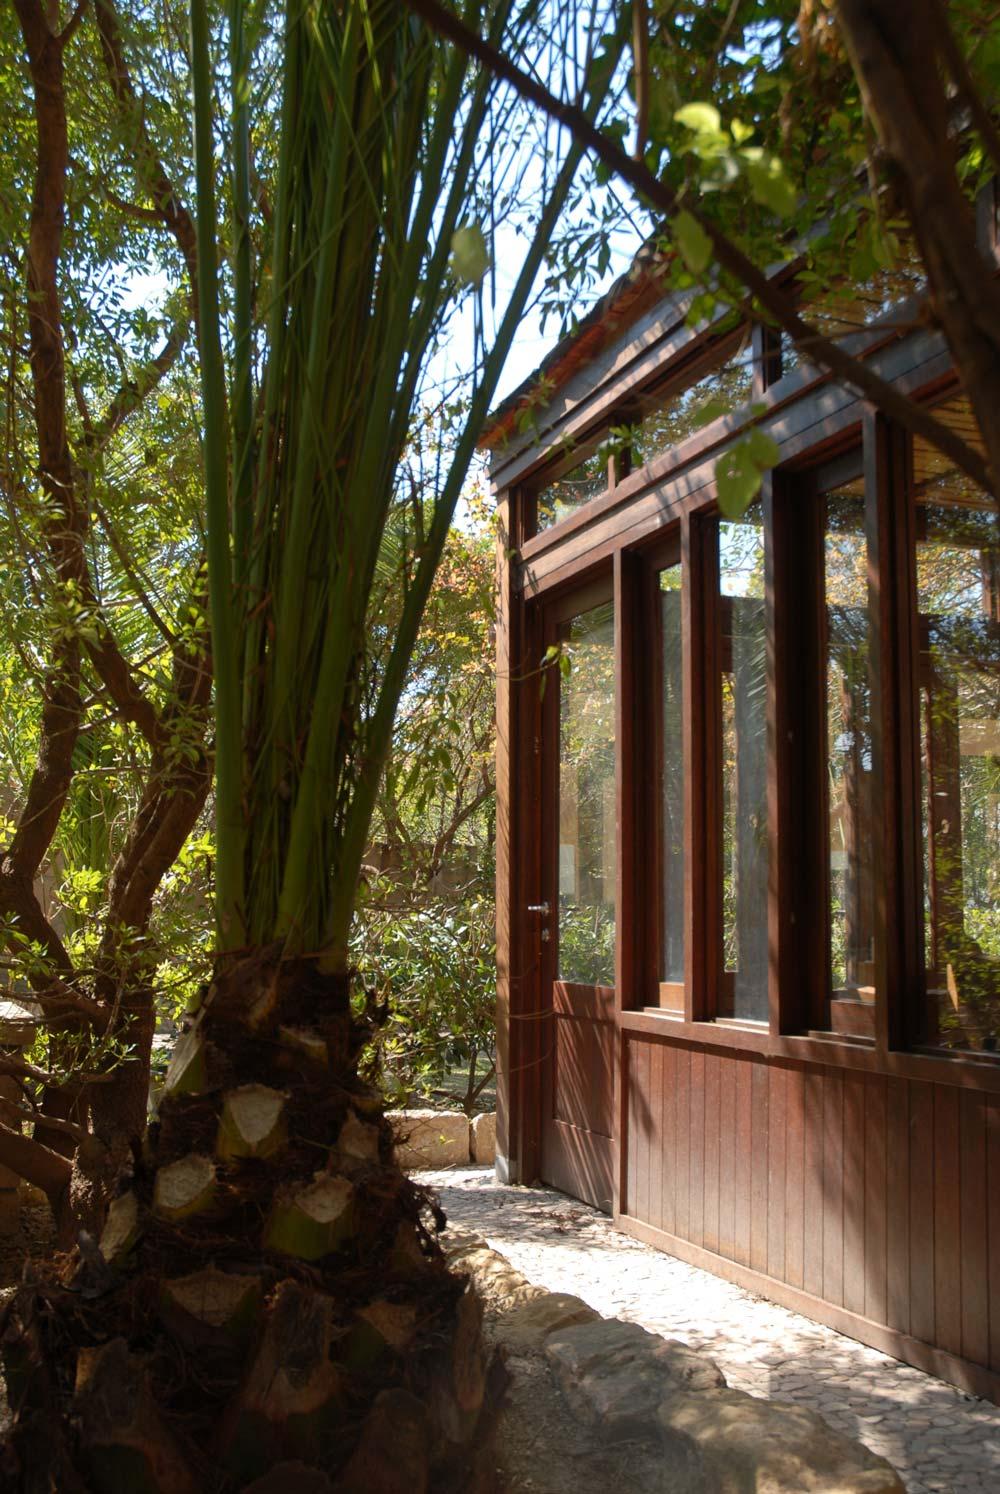 pistachio-trees-shadows-hotel-project-studio265-18